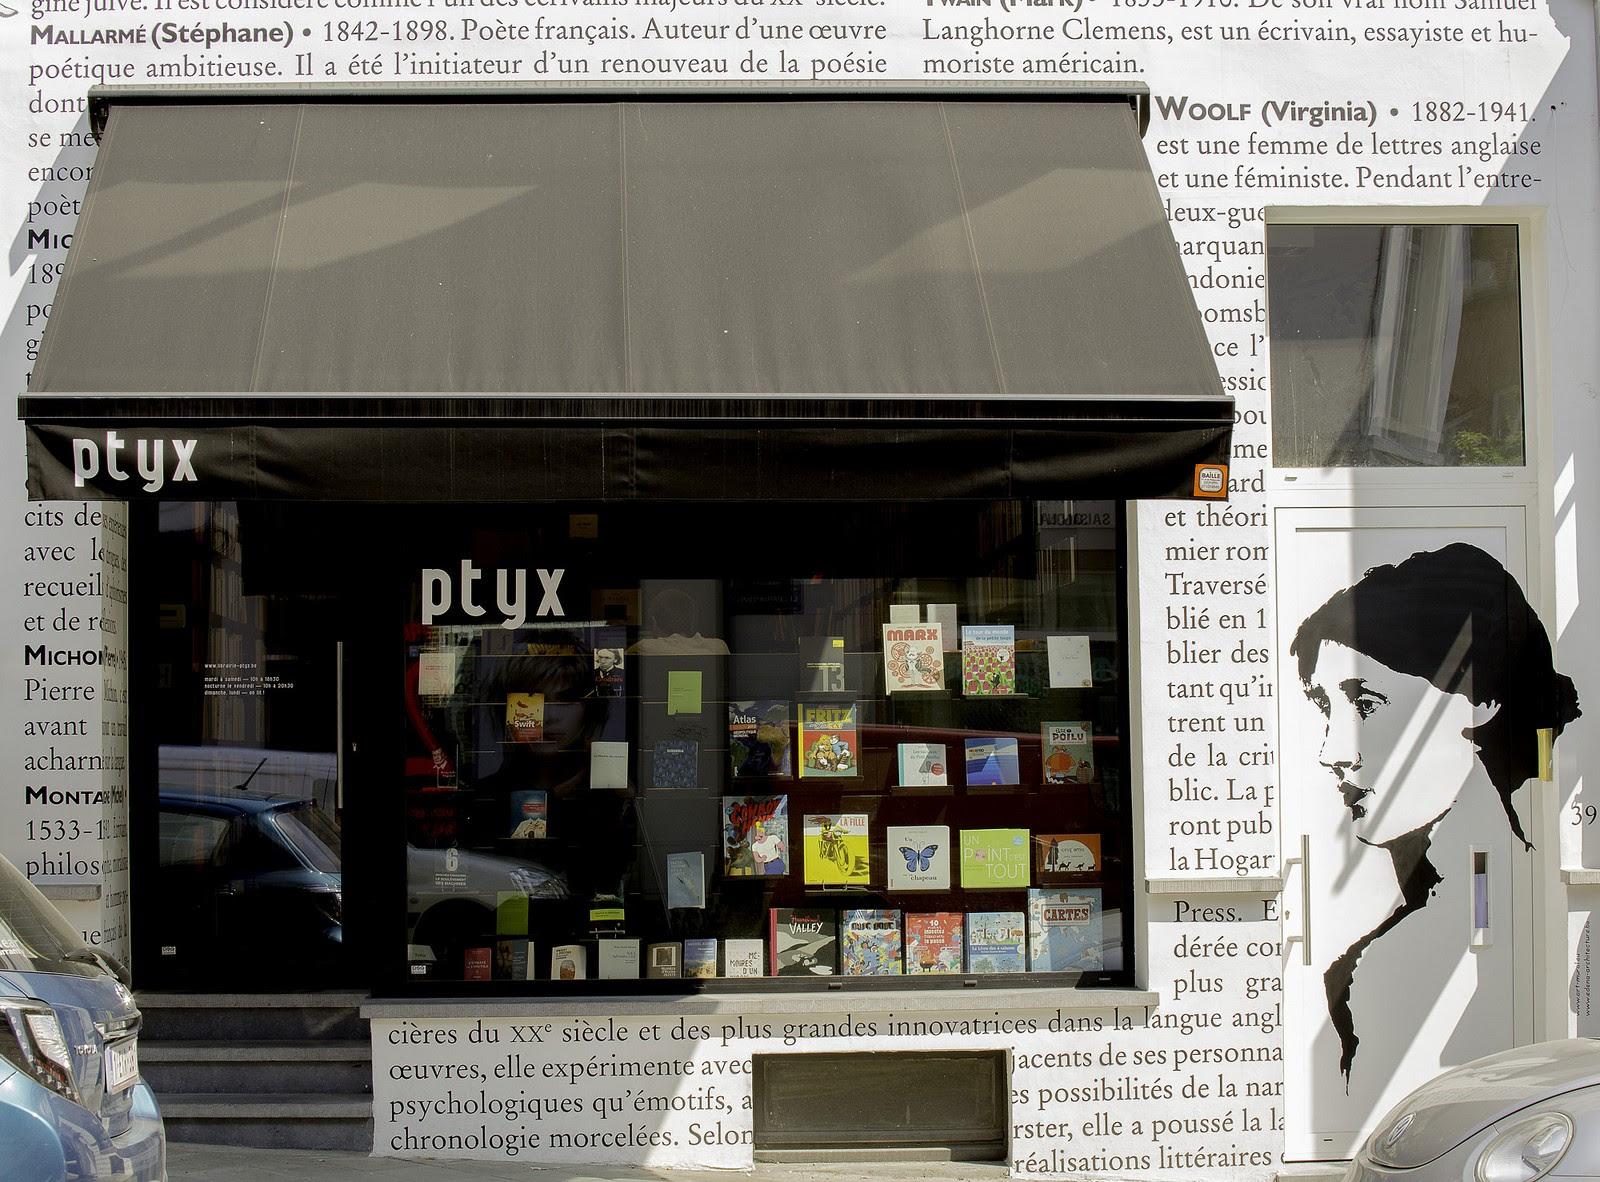 Le Bal Des Ardents - Lyon, França (Foto: Reprodução)